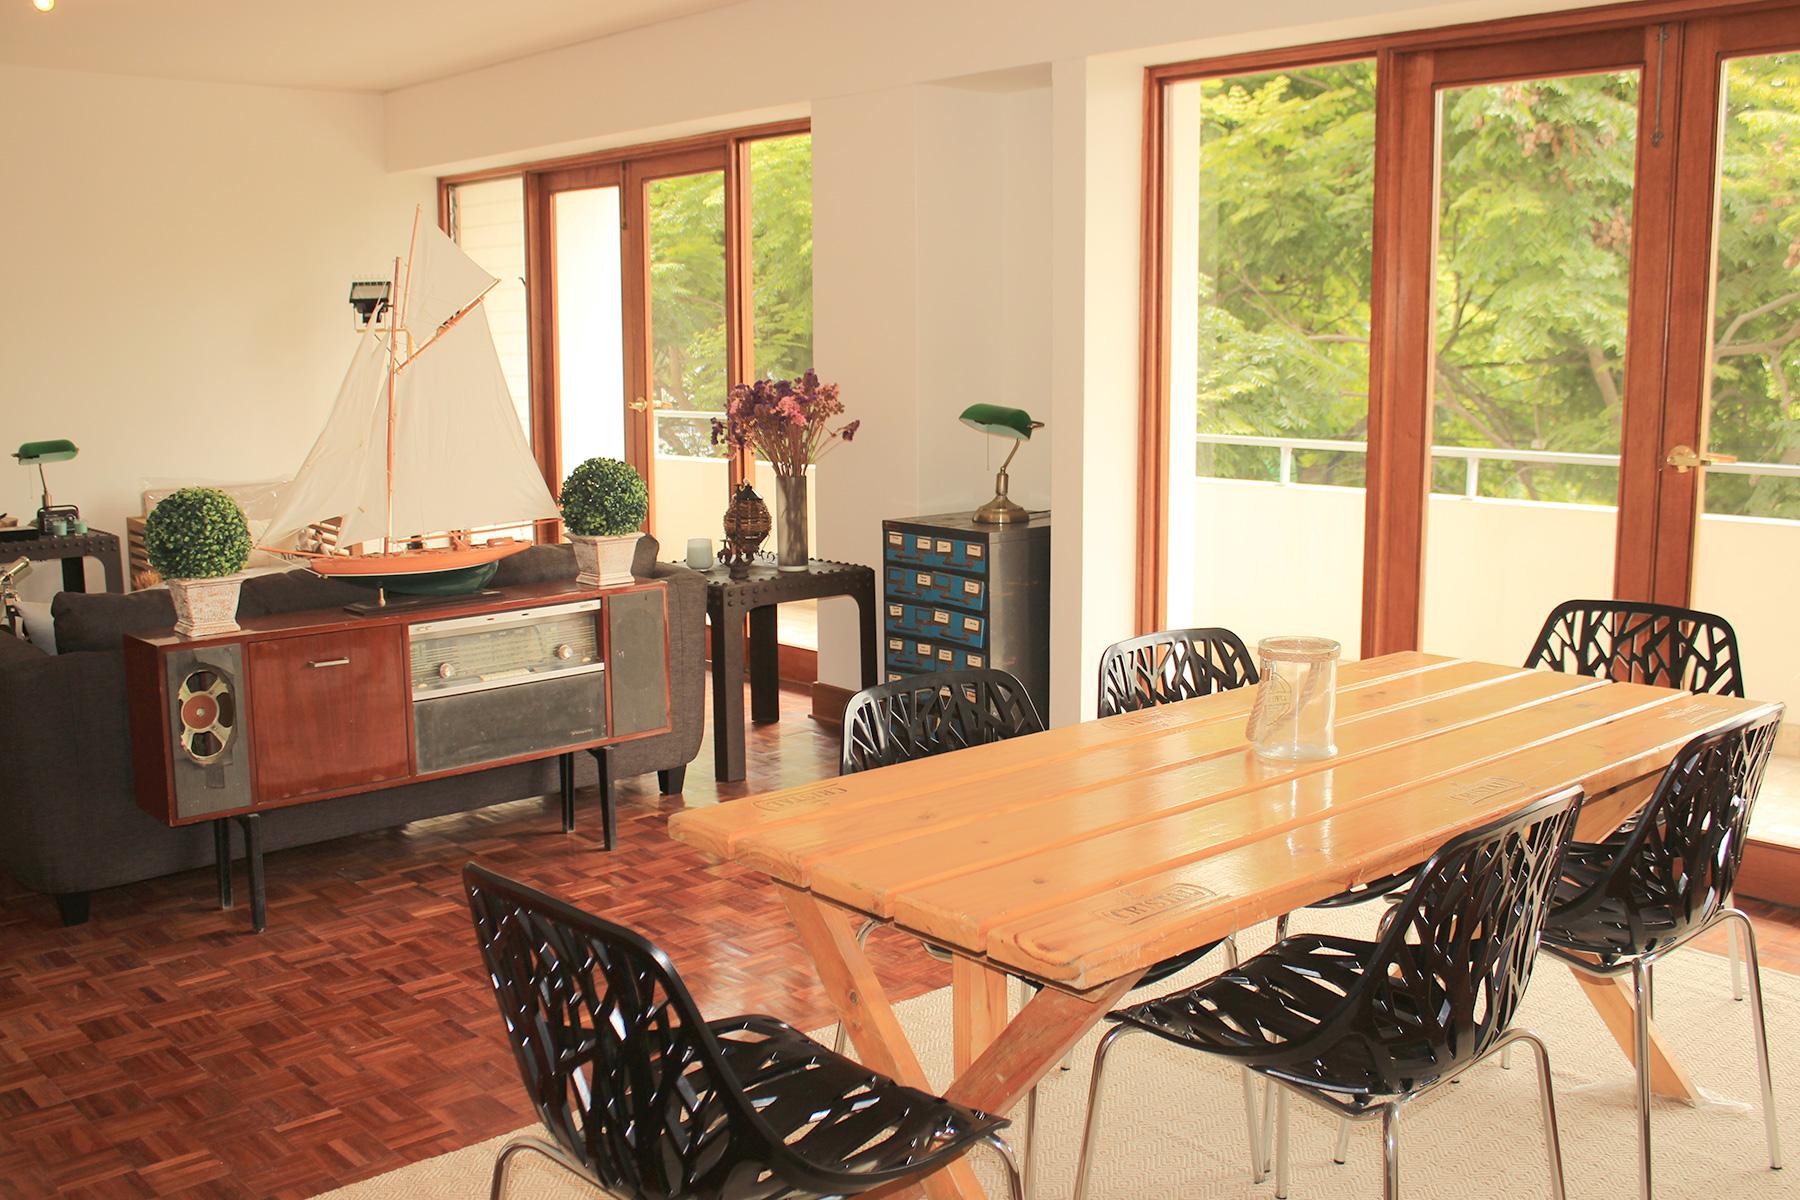 Apartment for Rent at Lindo departamento full amoblado totalmente remodelado Calle Libertadores San Isidro, Lima, 27 Peru